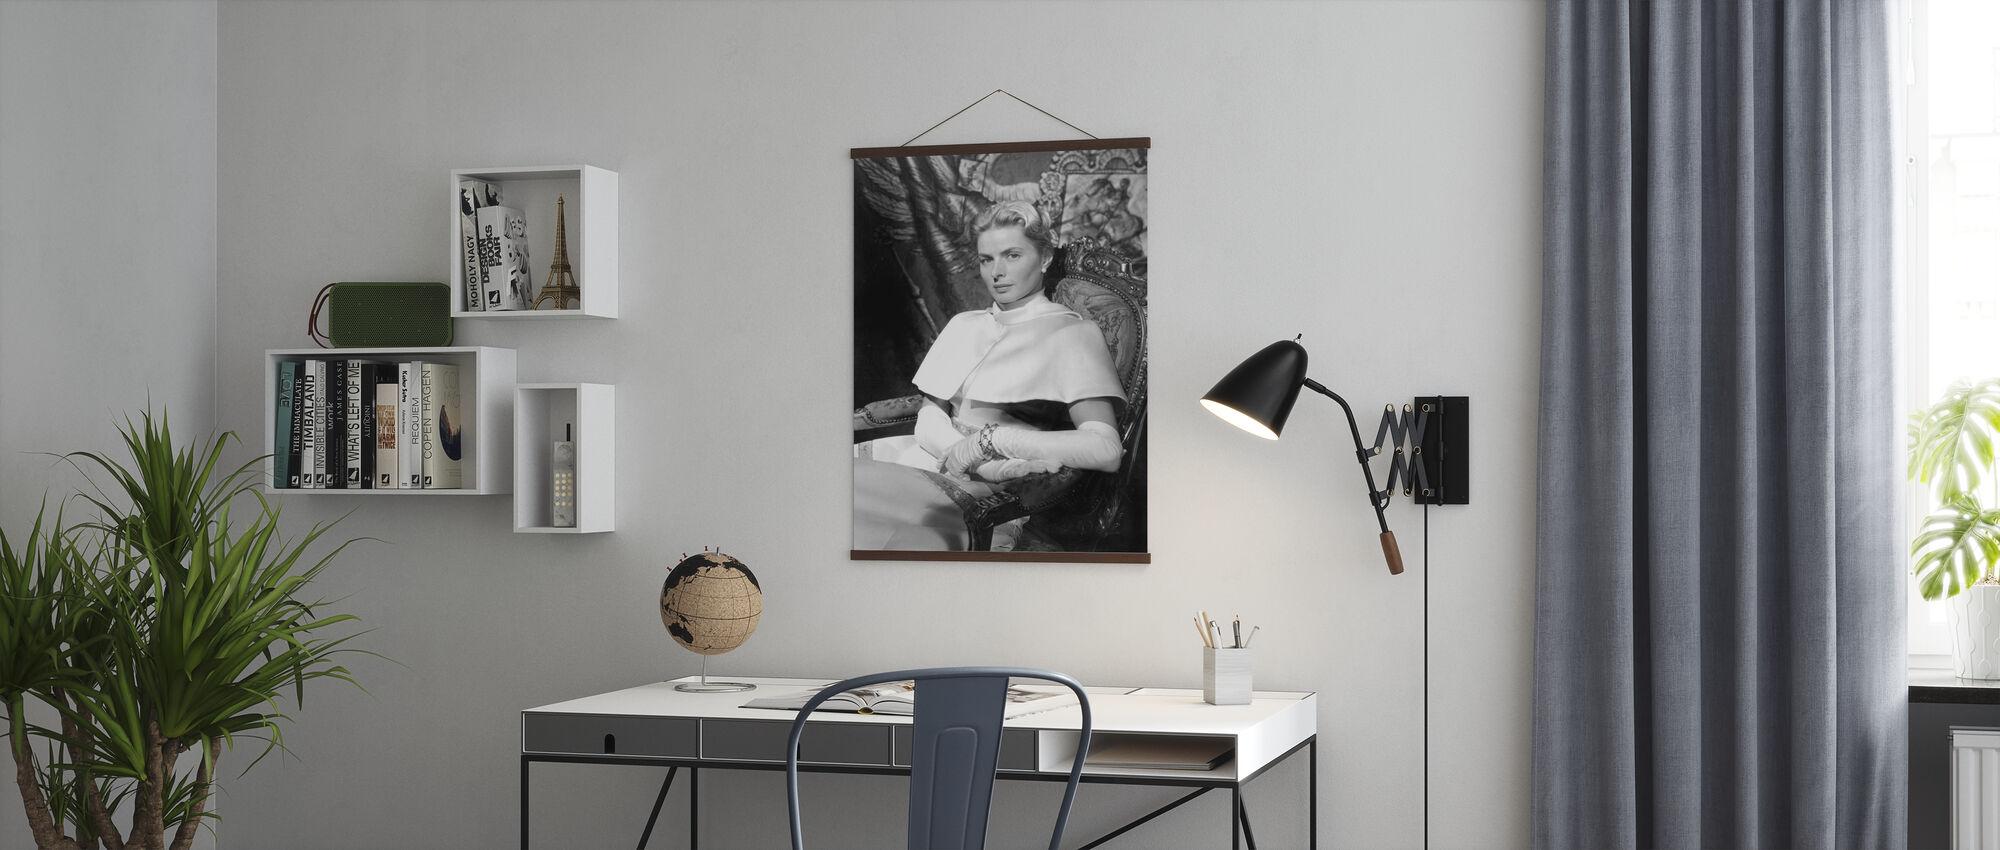 Anastasia 1986 - Juliste - Toimisto